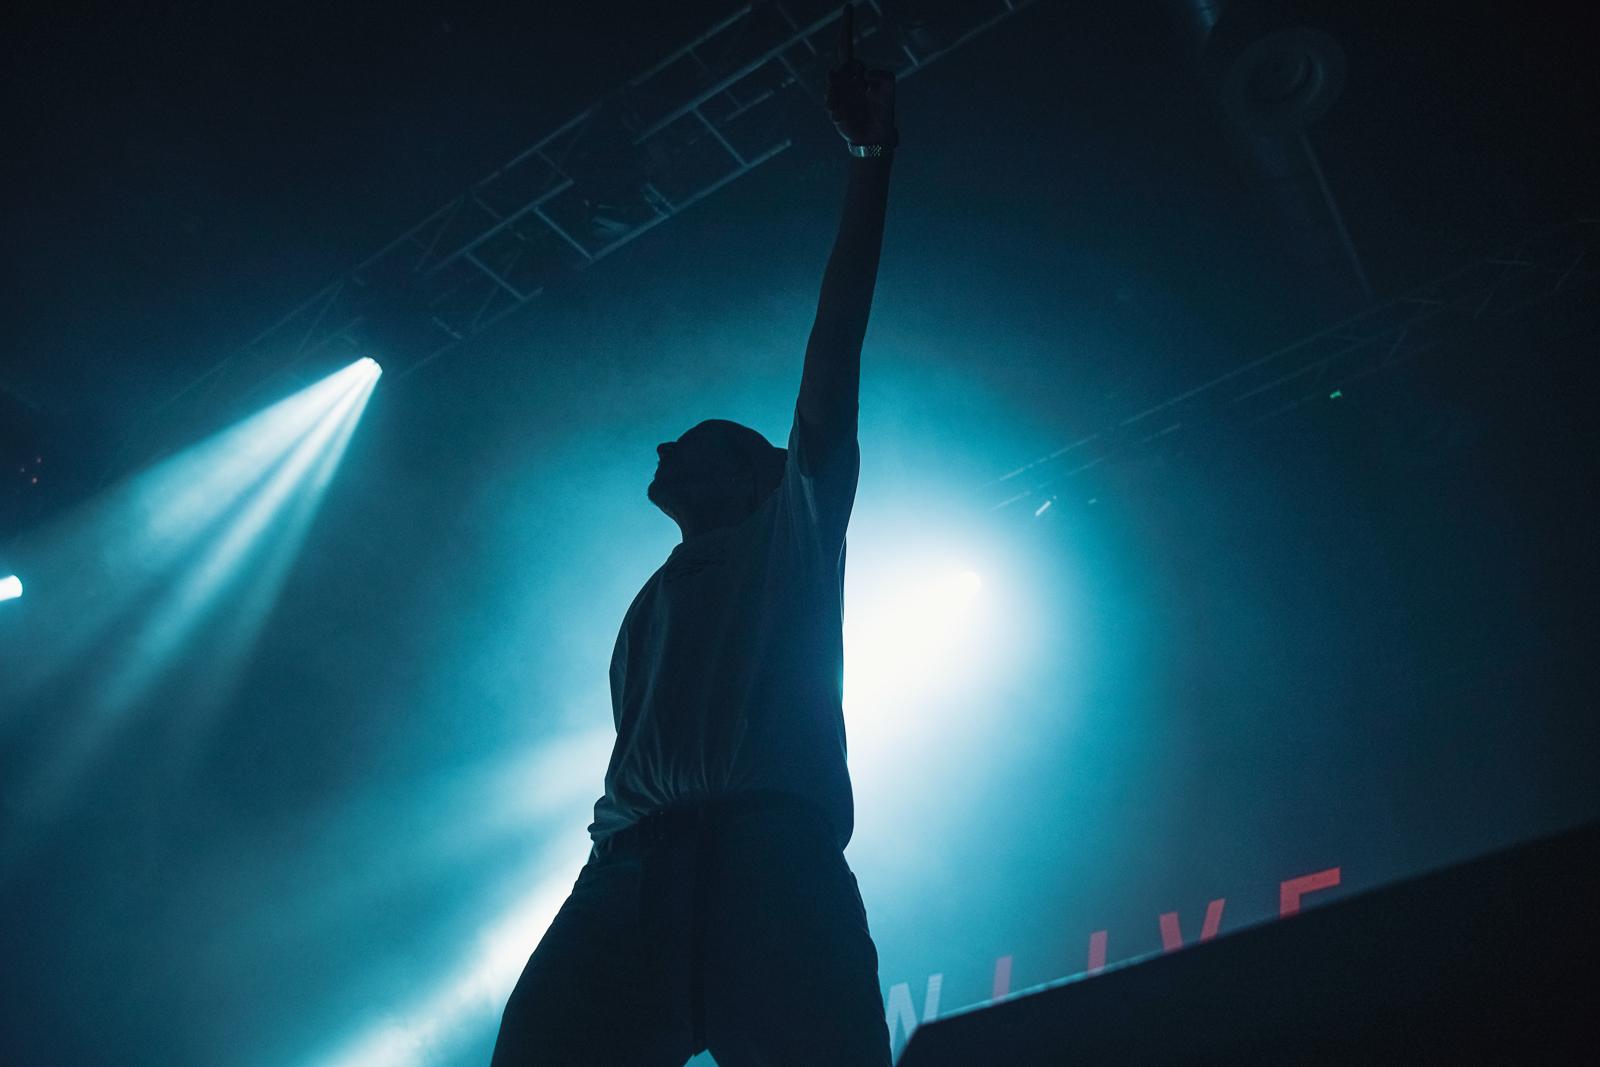 2019_RebeccaRuetten_Web_Spotify-27.jpg